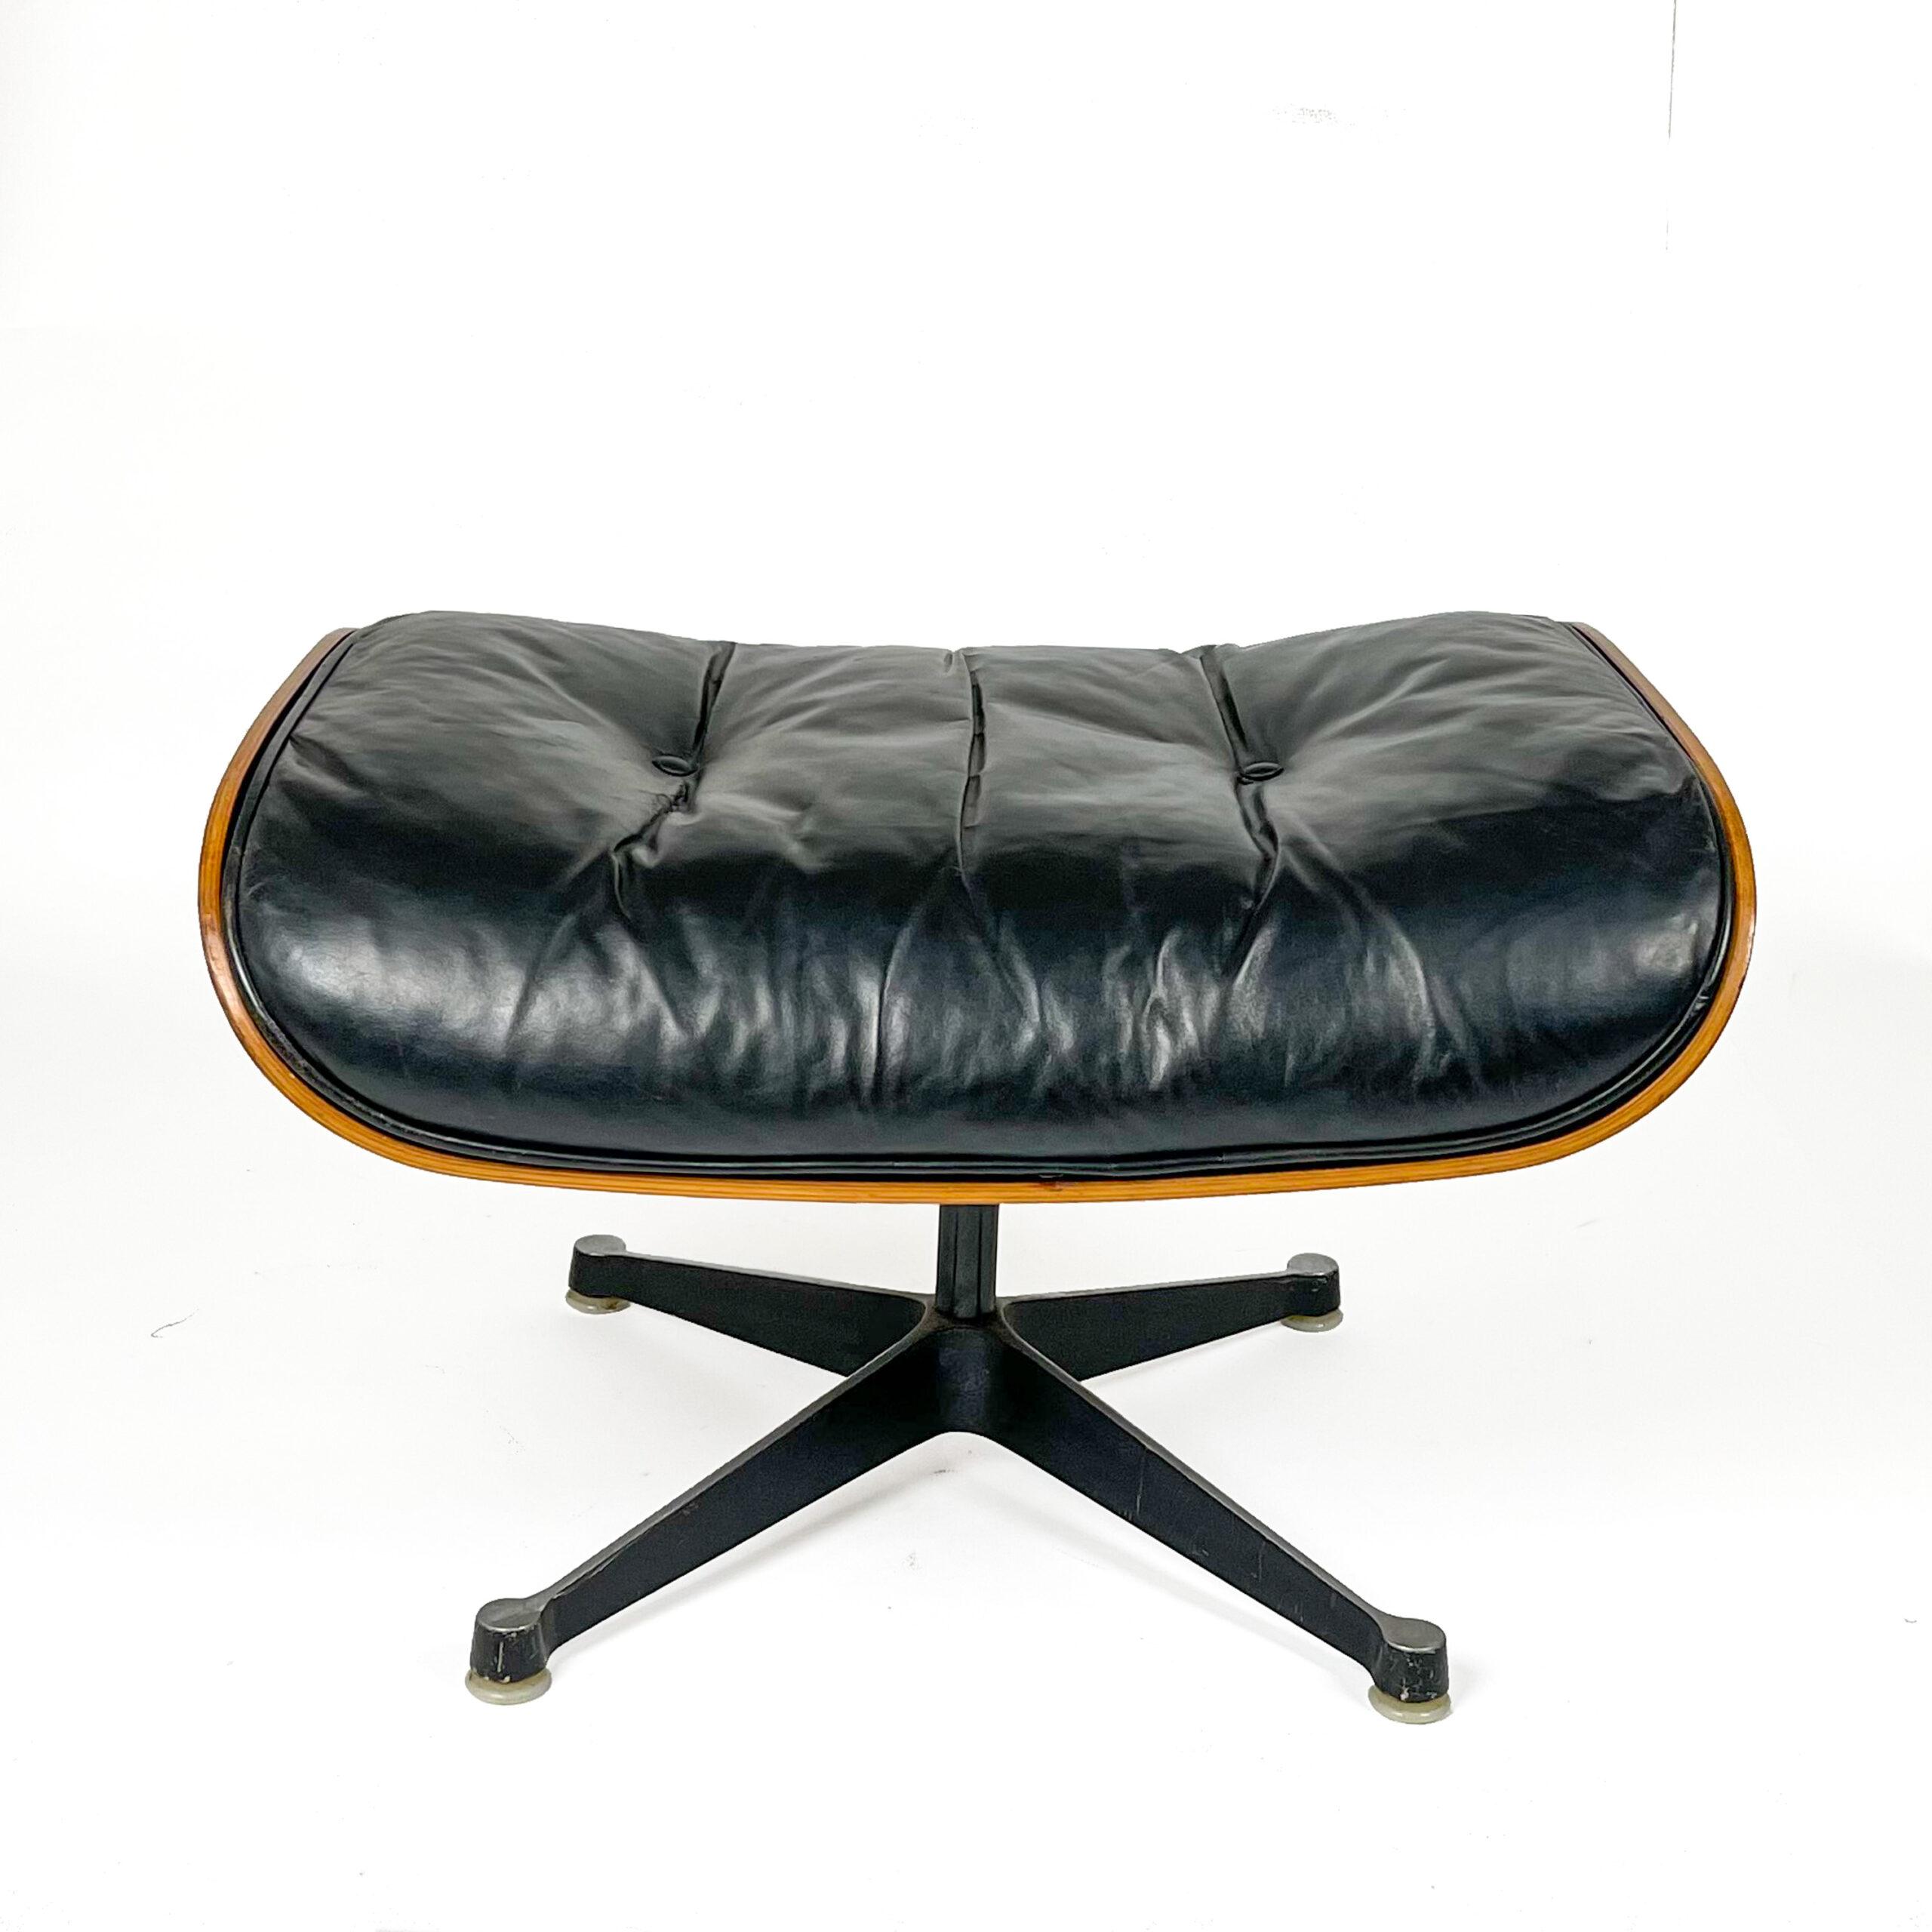 Eames Lounge Ottoman web-1138